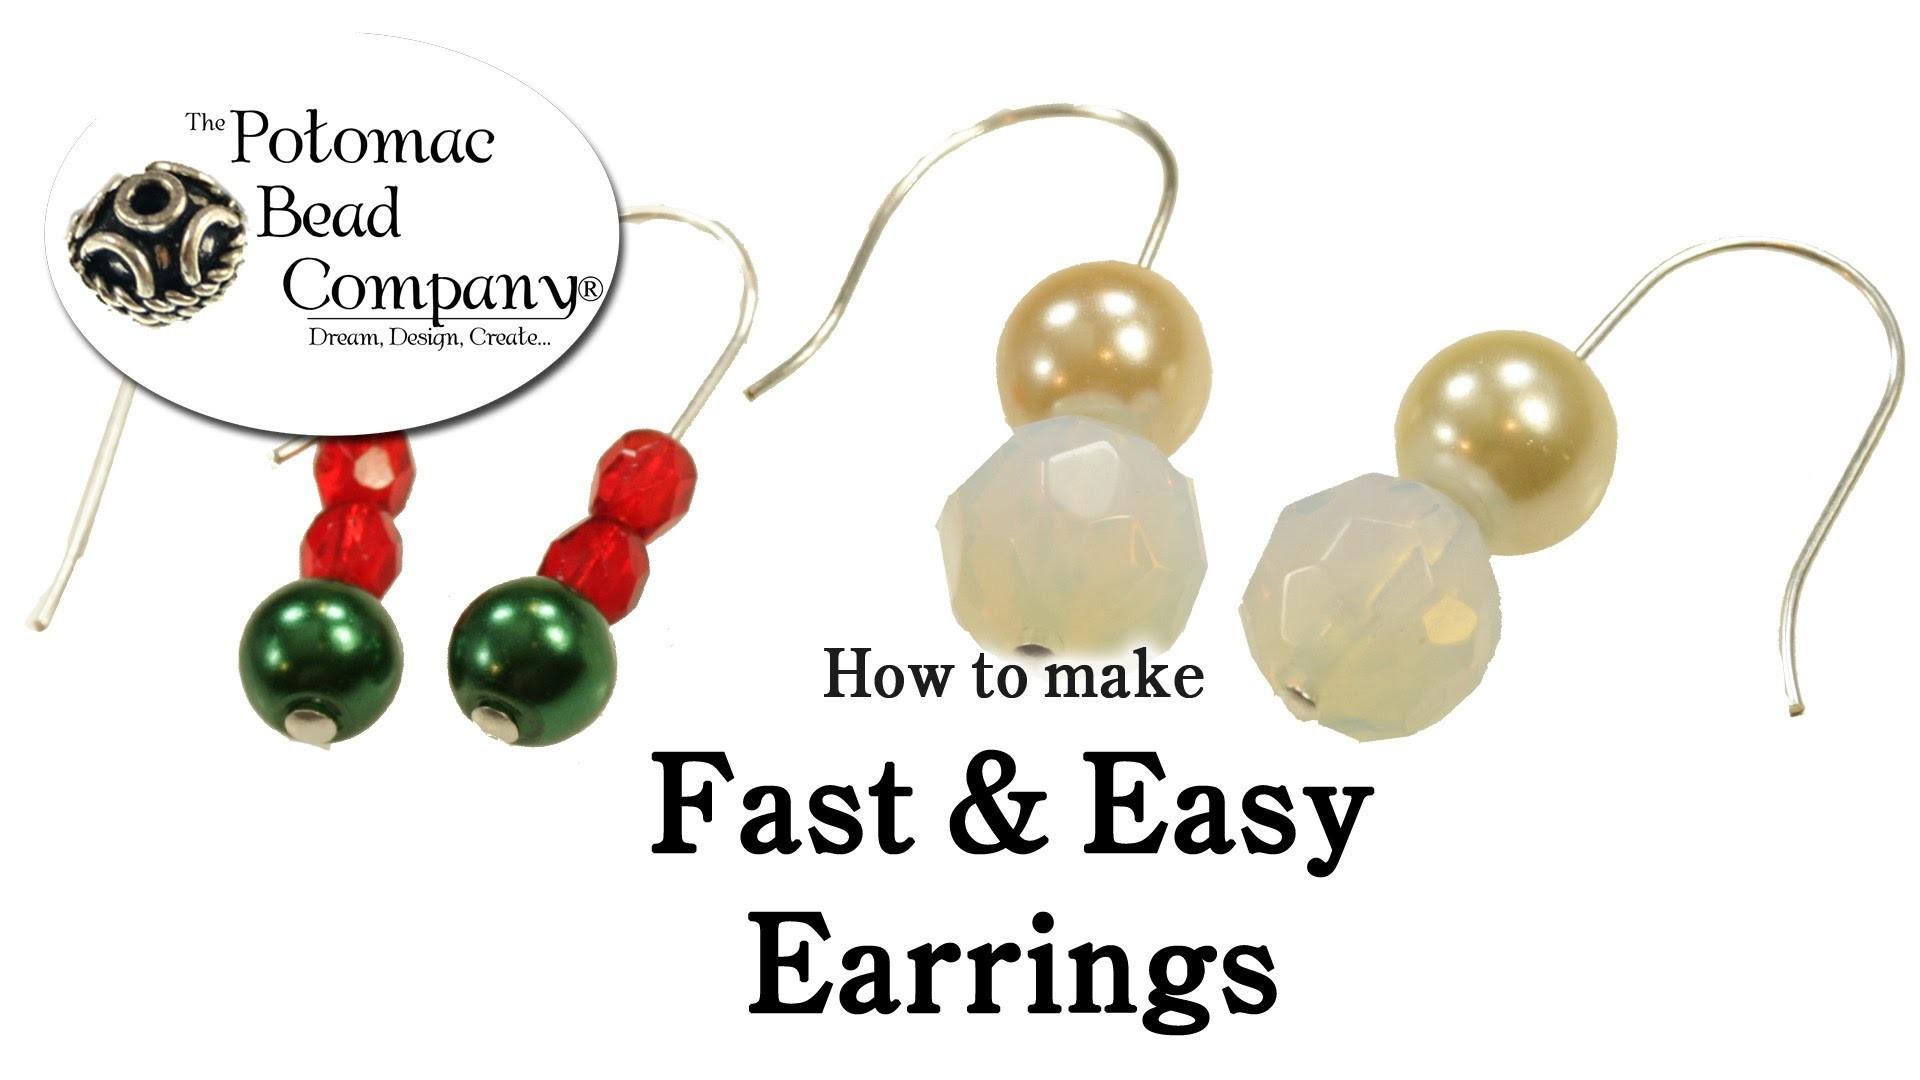 How to Make Fast & Easy Earrings